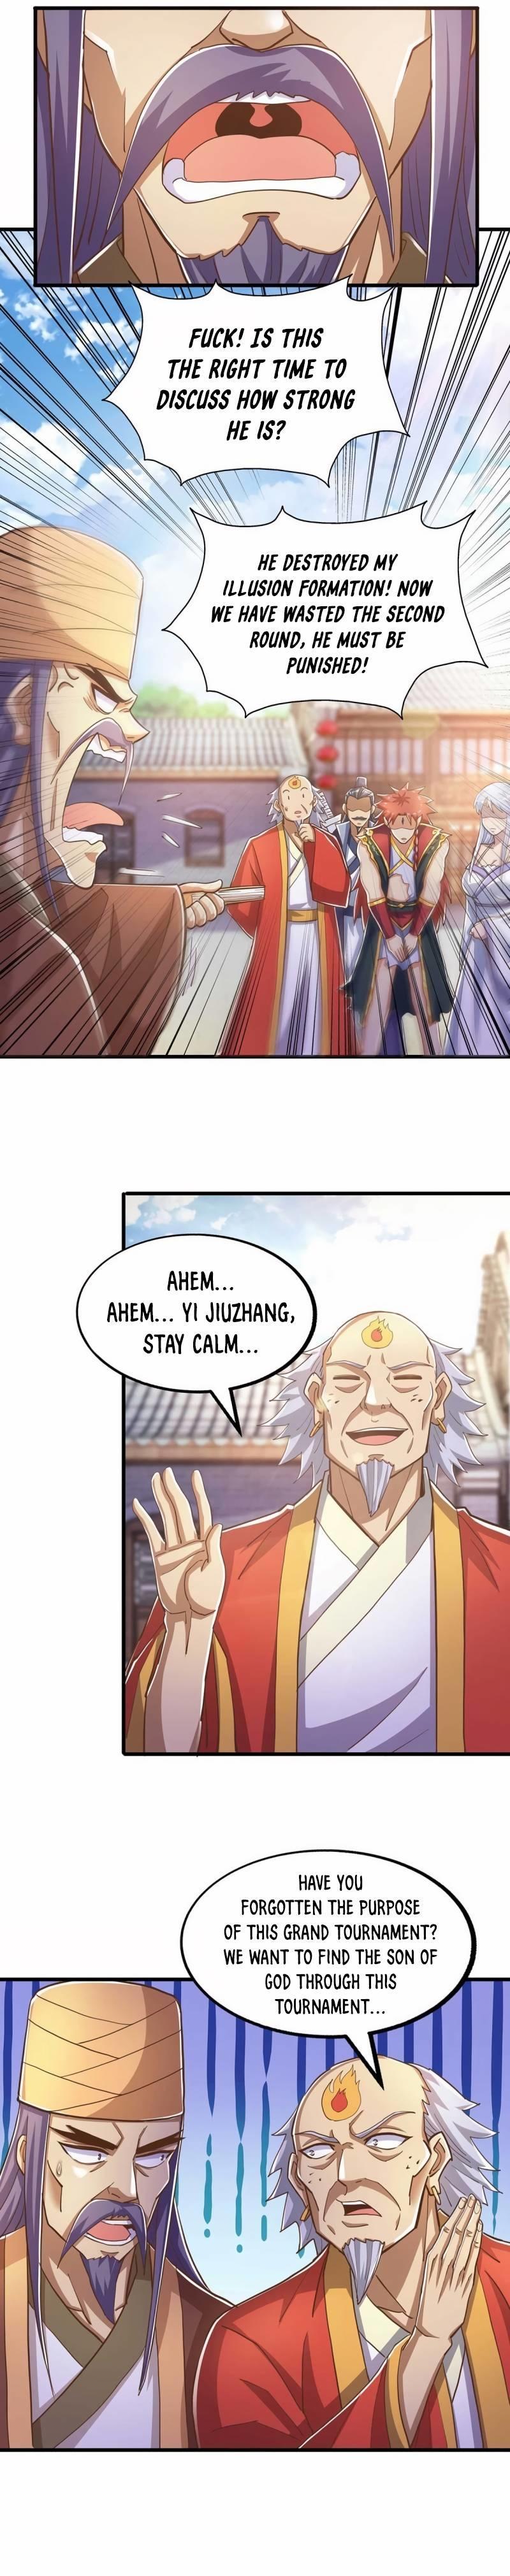 I Was Sealed 900 Million Times Chapter 38 page 2 - Mangakakalots.com